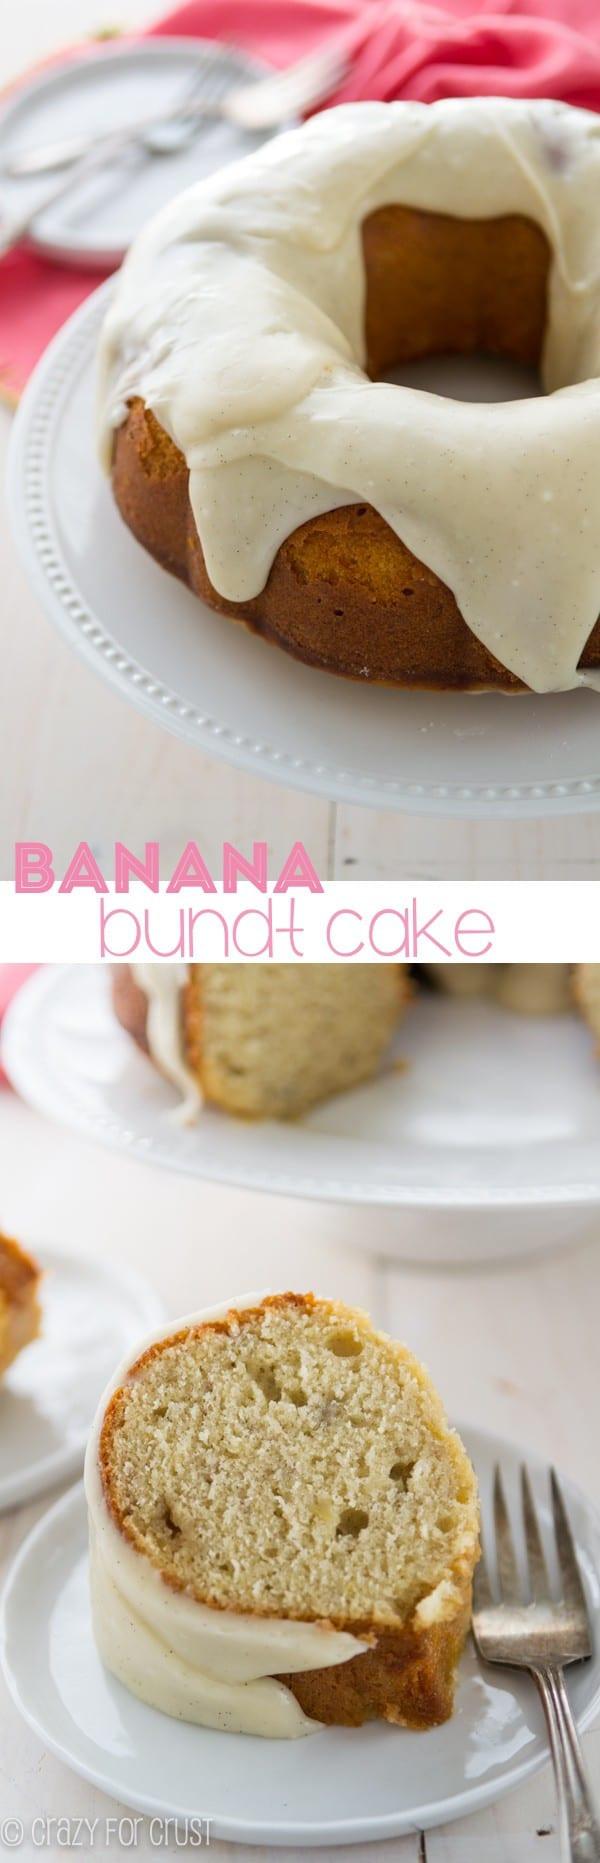 Crazy Banana Cake  Banana Bundt Cake with cream cheese frosting Crazy for